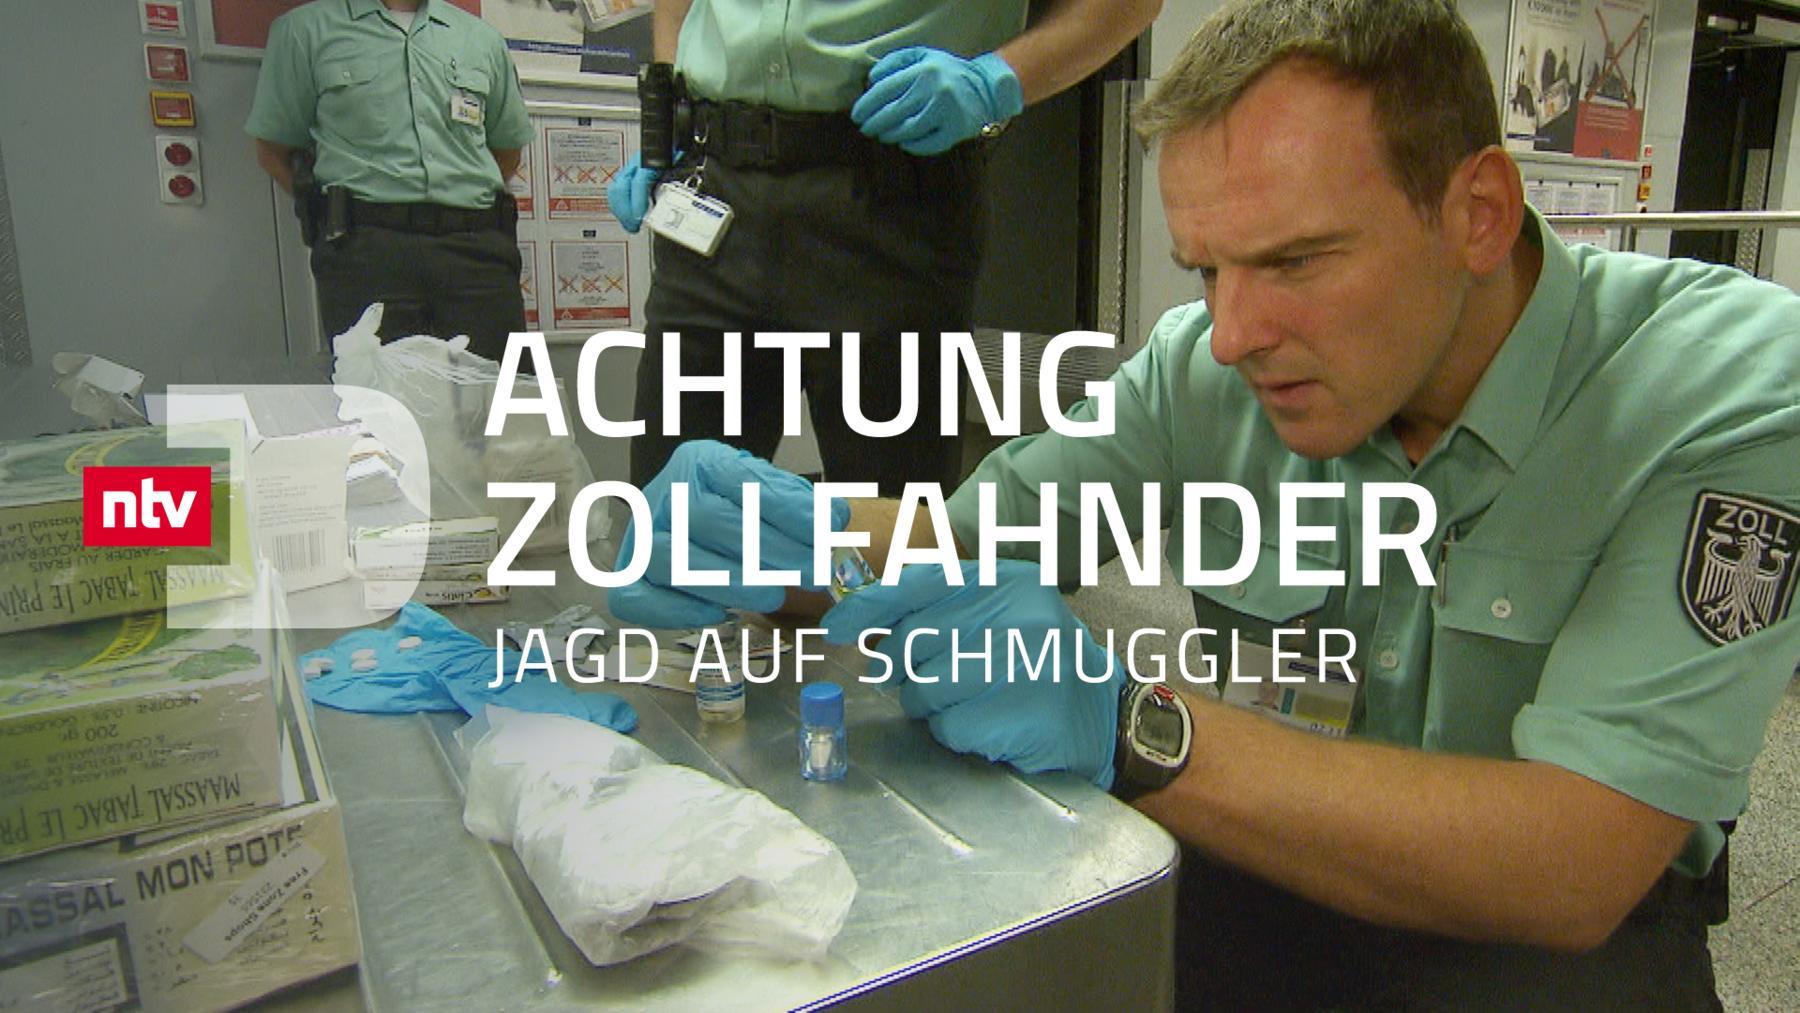 Achtung Zollfahnder - Jagd auf Schmuggler